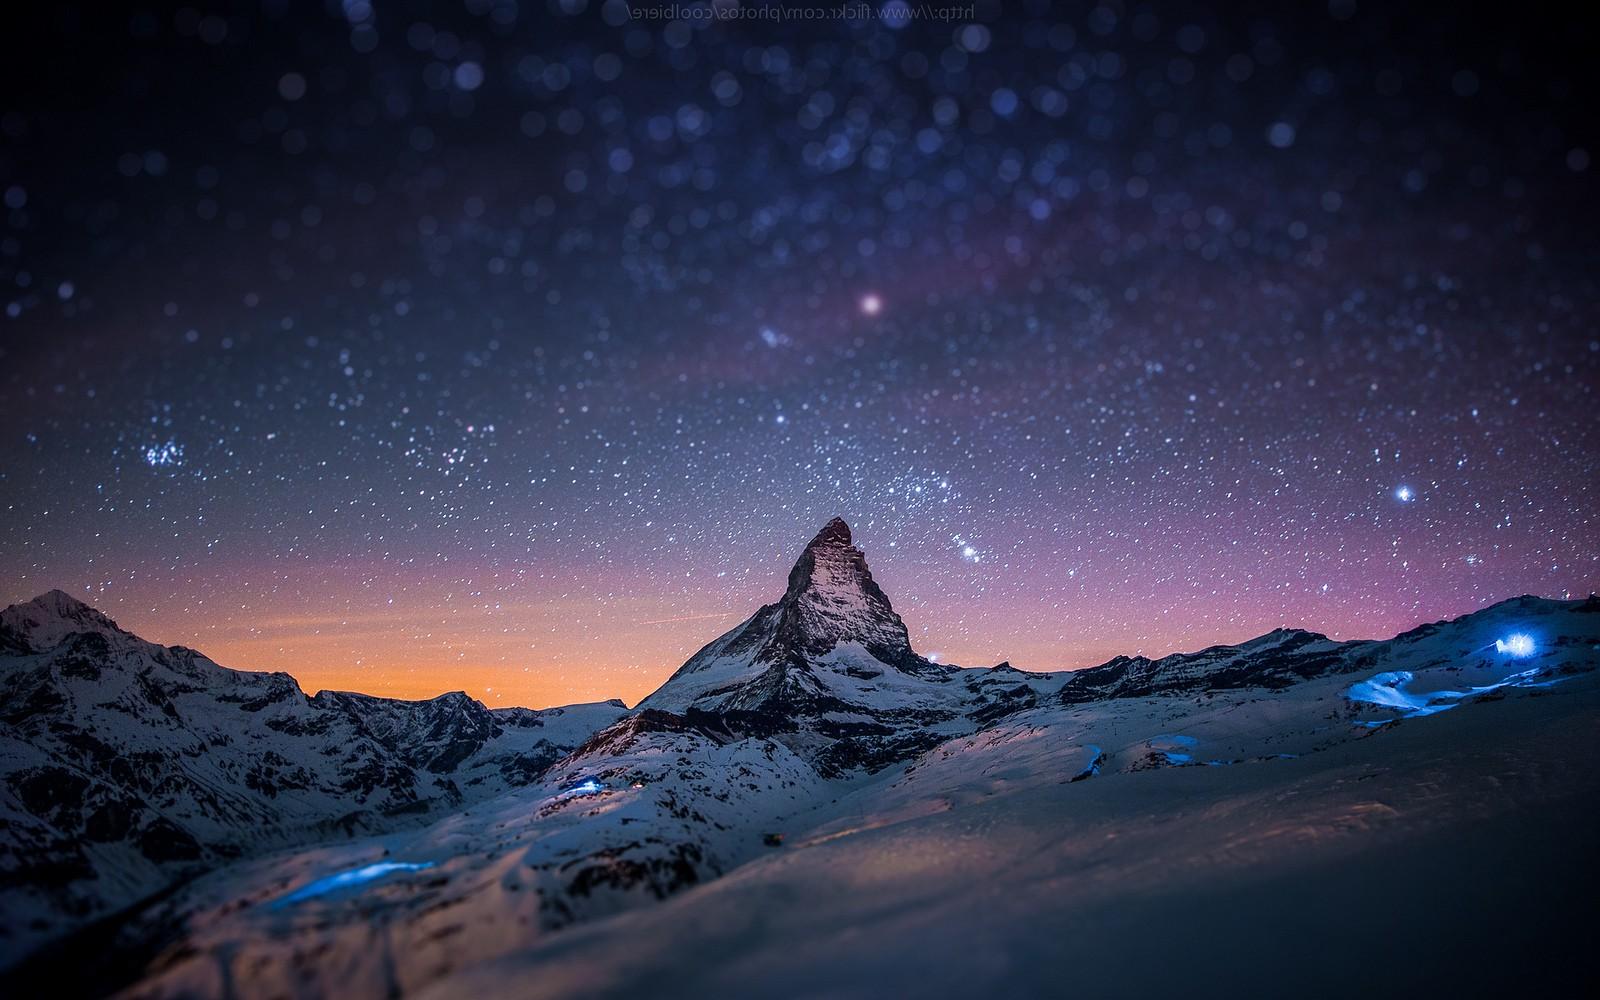 Wallpaper Landscape Night Nature Sky Snow Winter